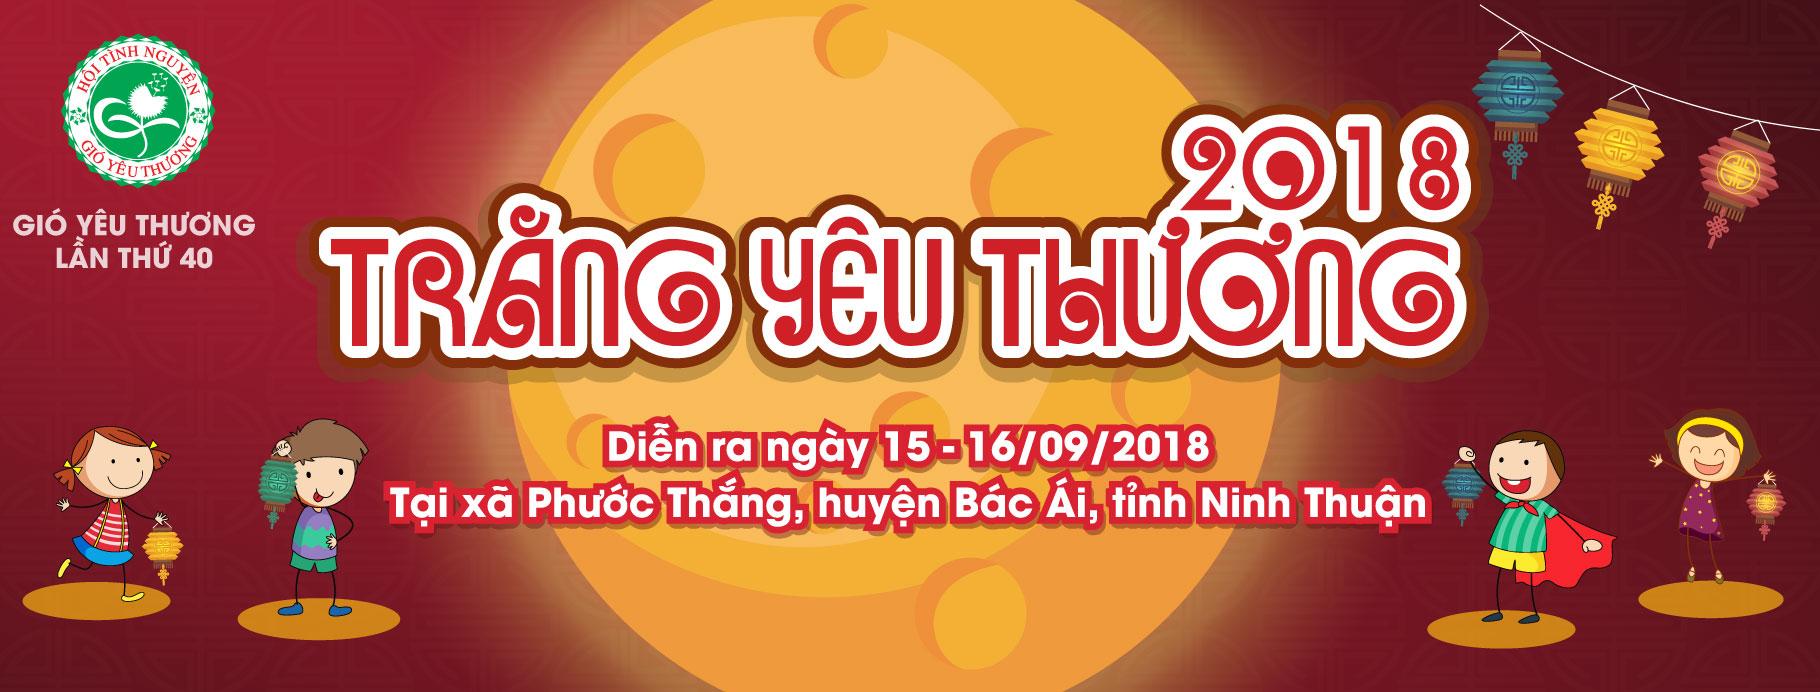 chuong-trinh-trang-yeu-thuong-2018